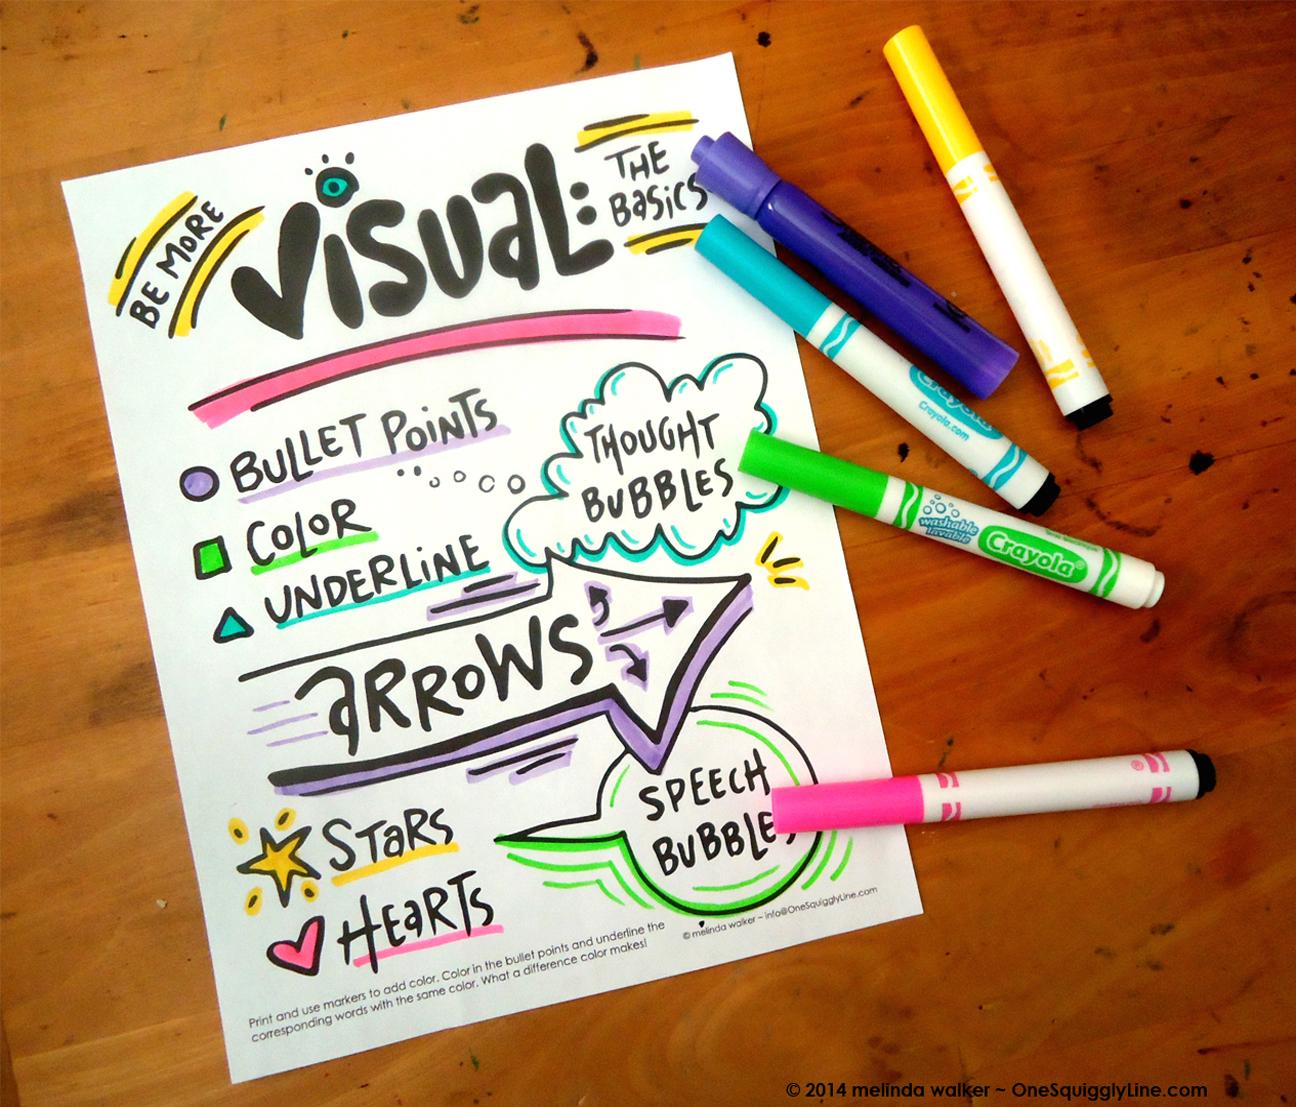 Be More Visual: The Basics